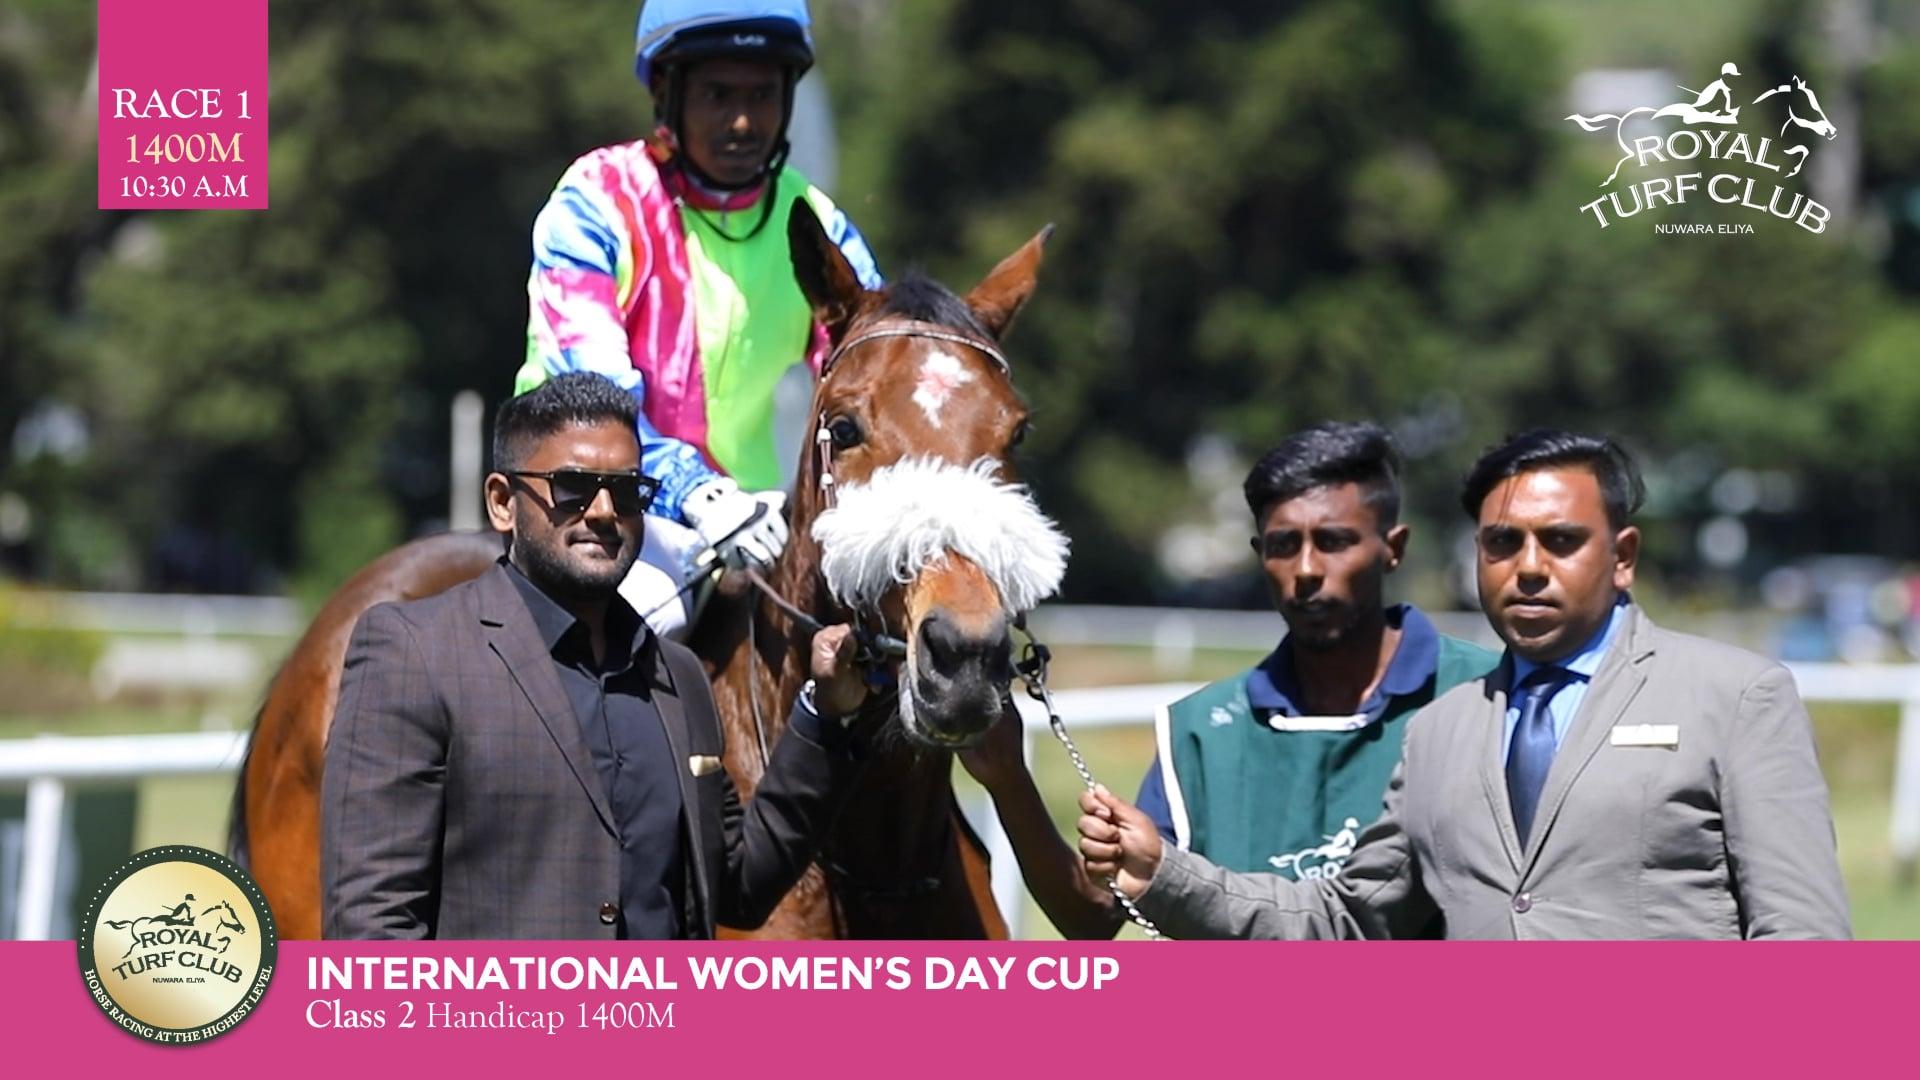 Internantional Womens day cup